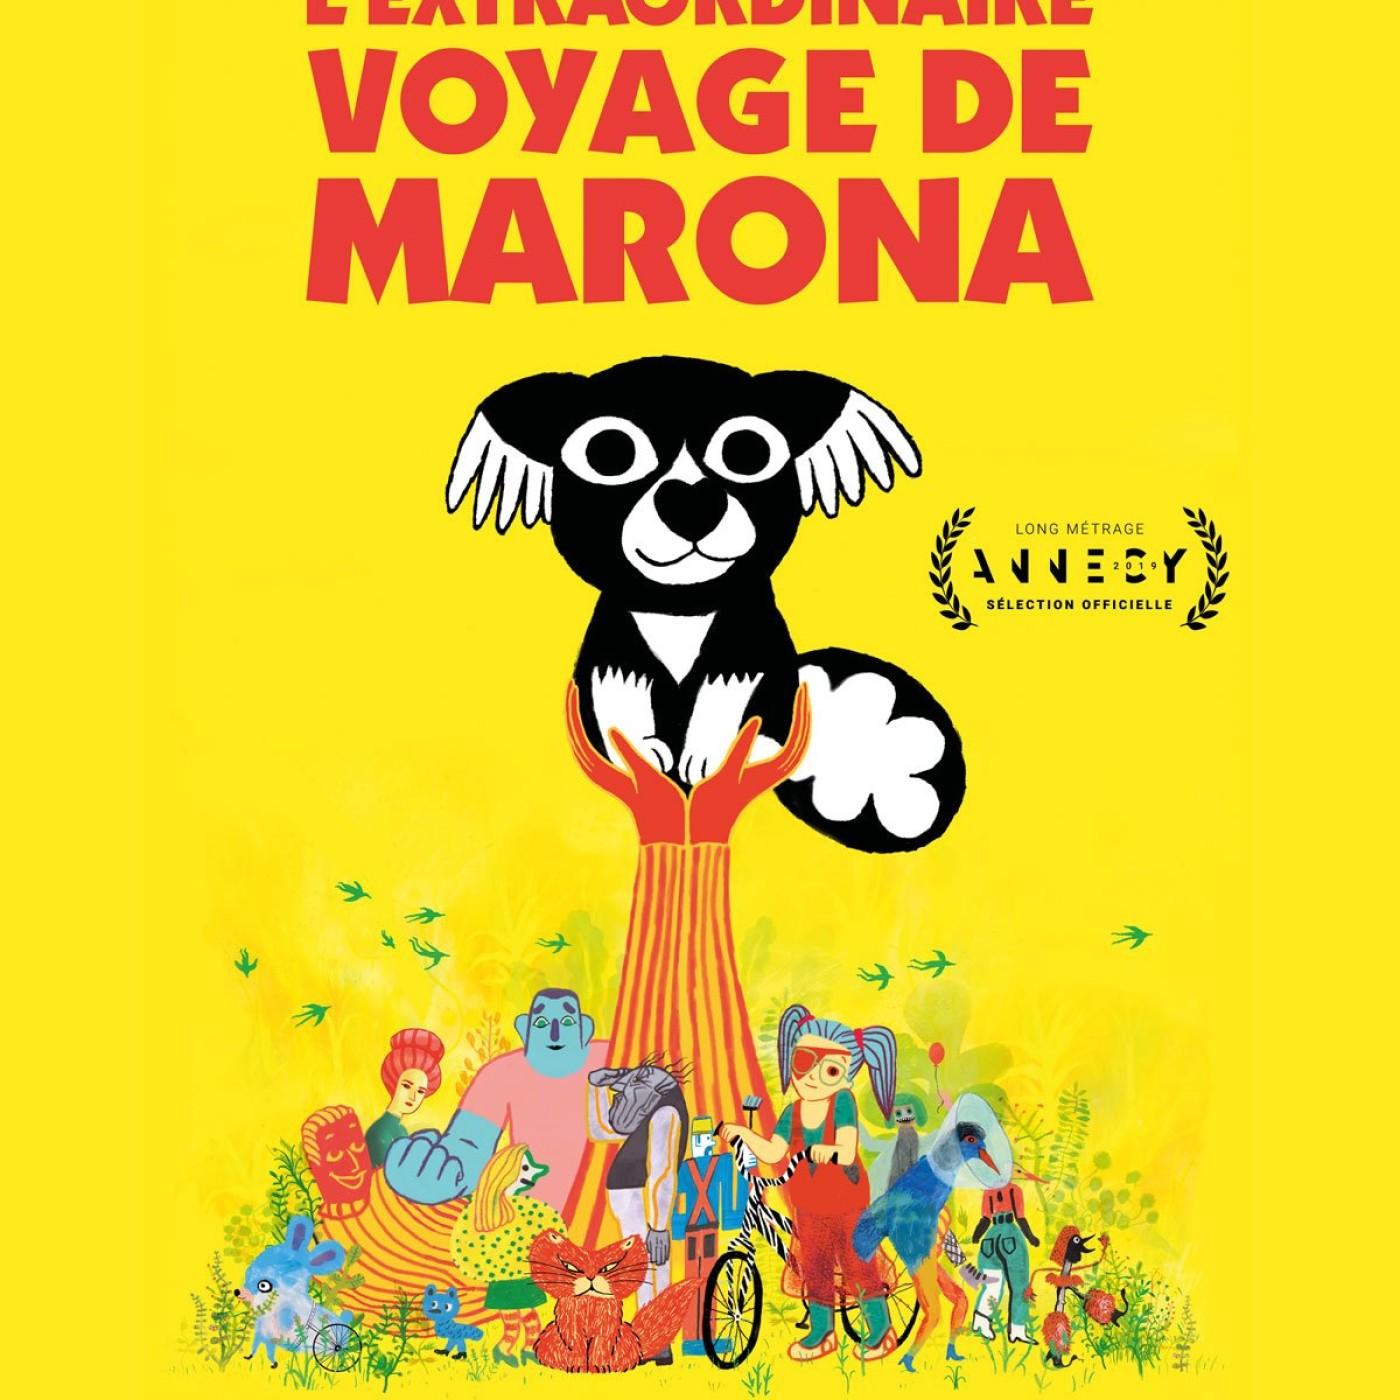 Critique du Film L'EXTRAORDINAIRE VOYAGE DE MARONA